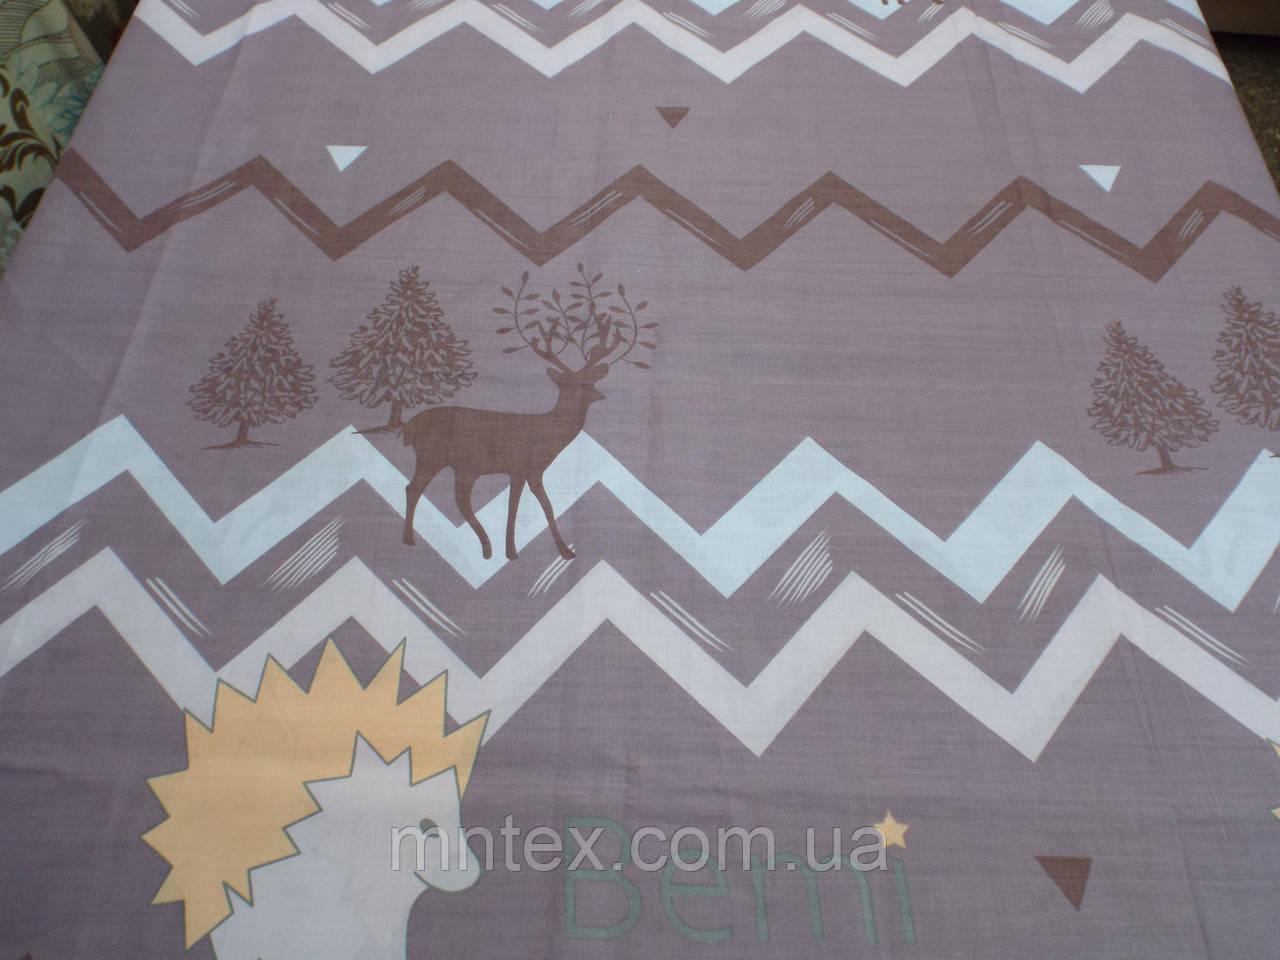 Ткань для пошива постельного белья бязь голд Зигзаг